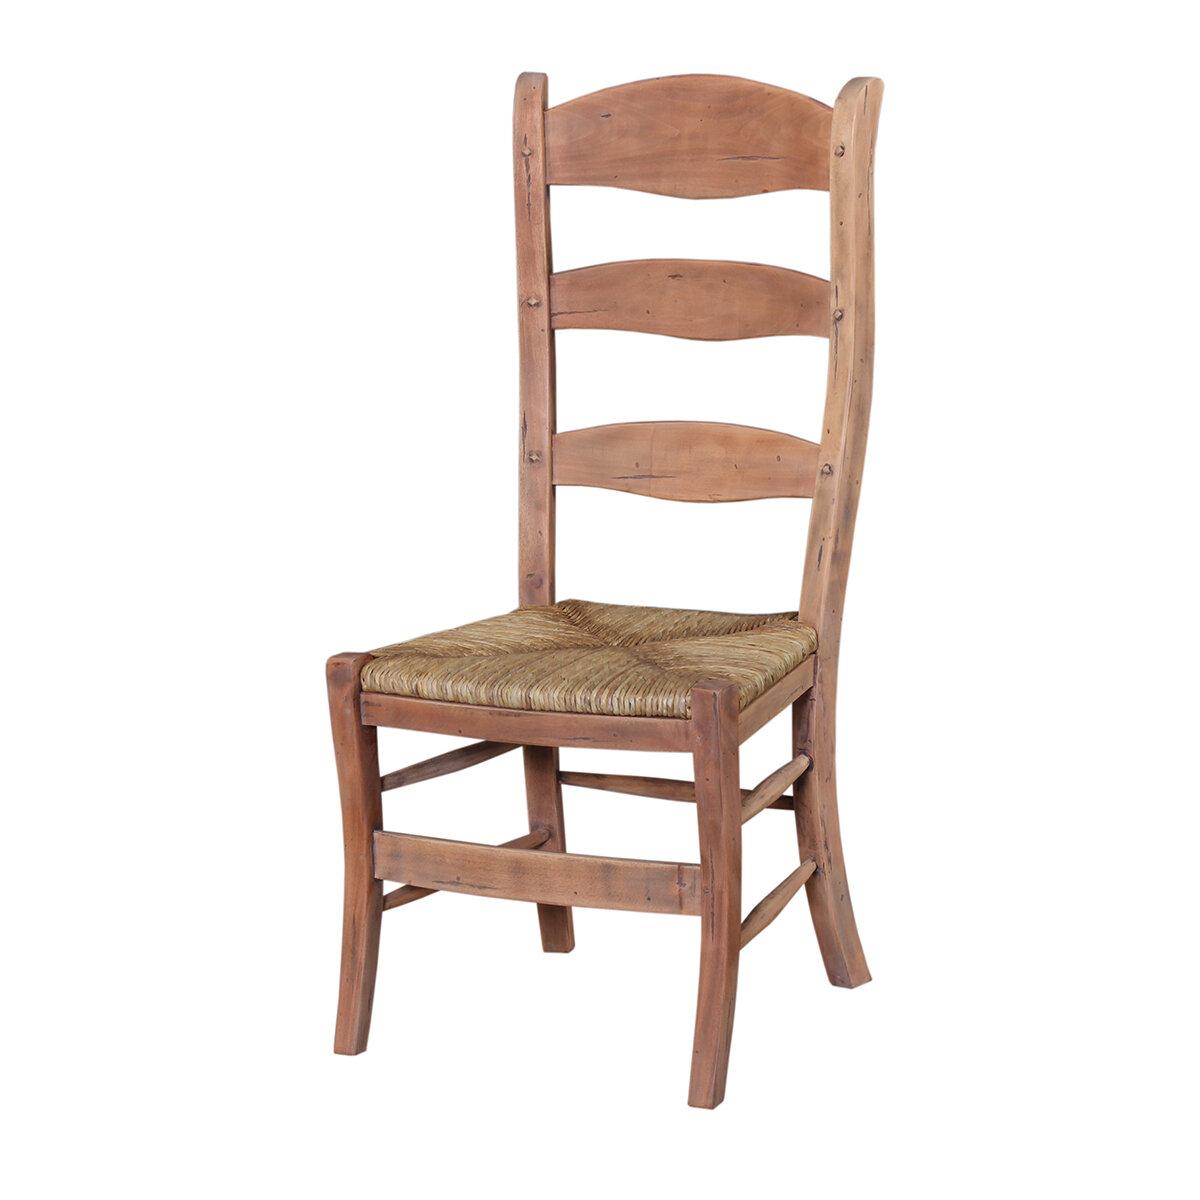 Peg & Dowel Driftwood Ladder Back Chair